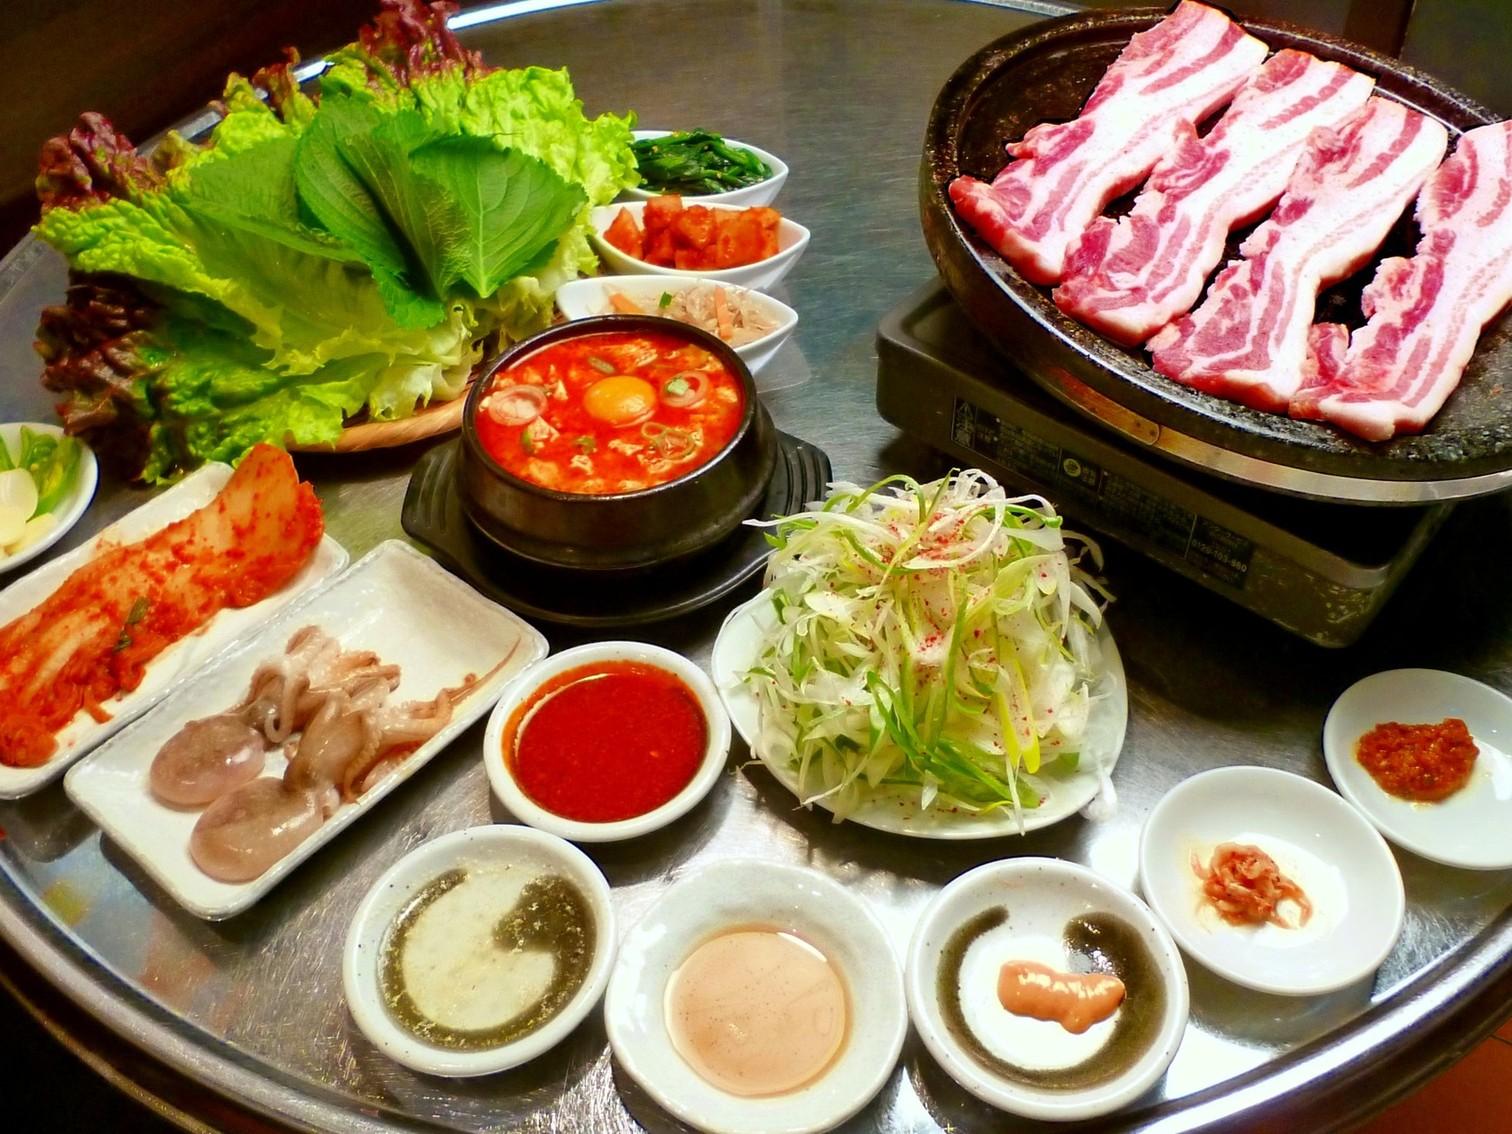 https://tabelog.ssl.k-img.com/restaurant/images/Rvw/11214/11214565.jpg